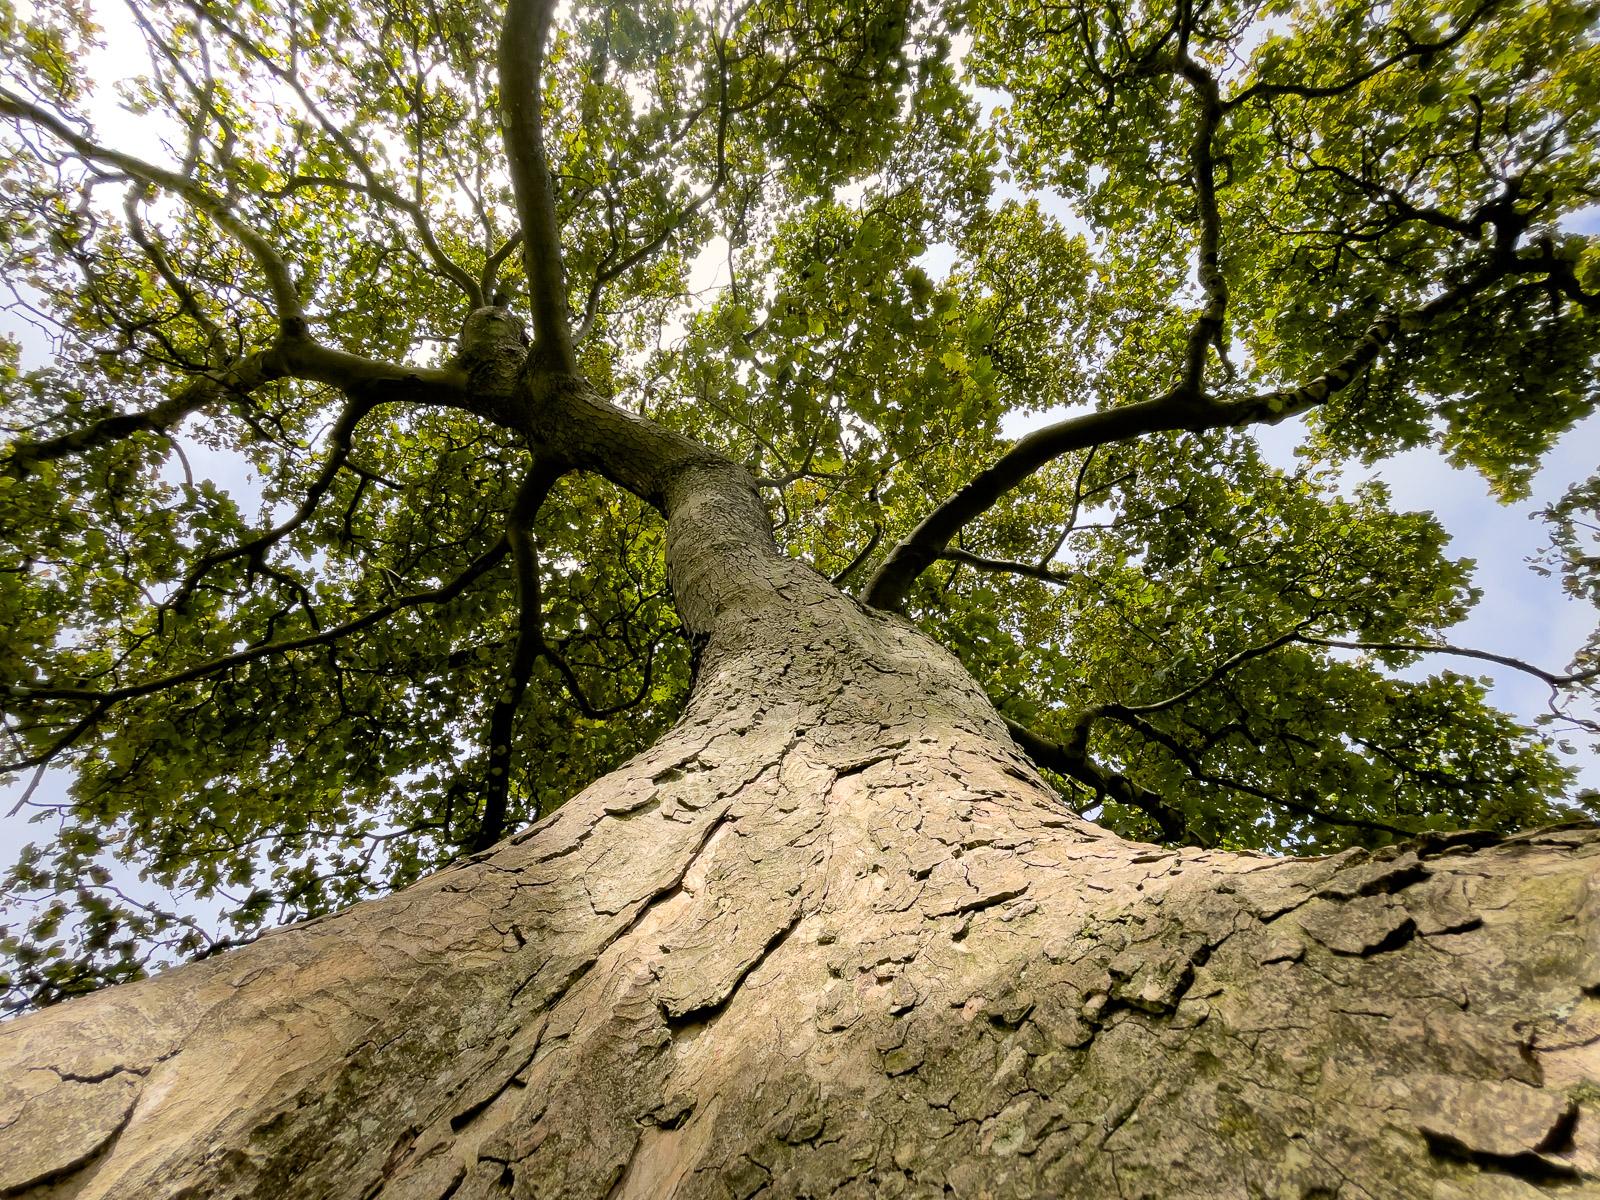 Sycamore Tree - Lynchcombe, Mendip Hills, Somerset, UK. ID IMG_5991